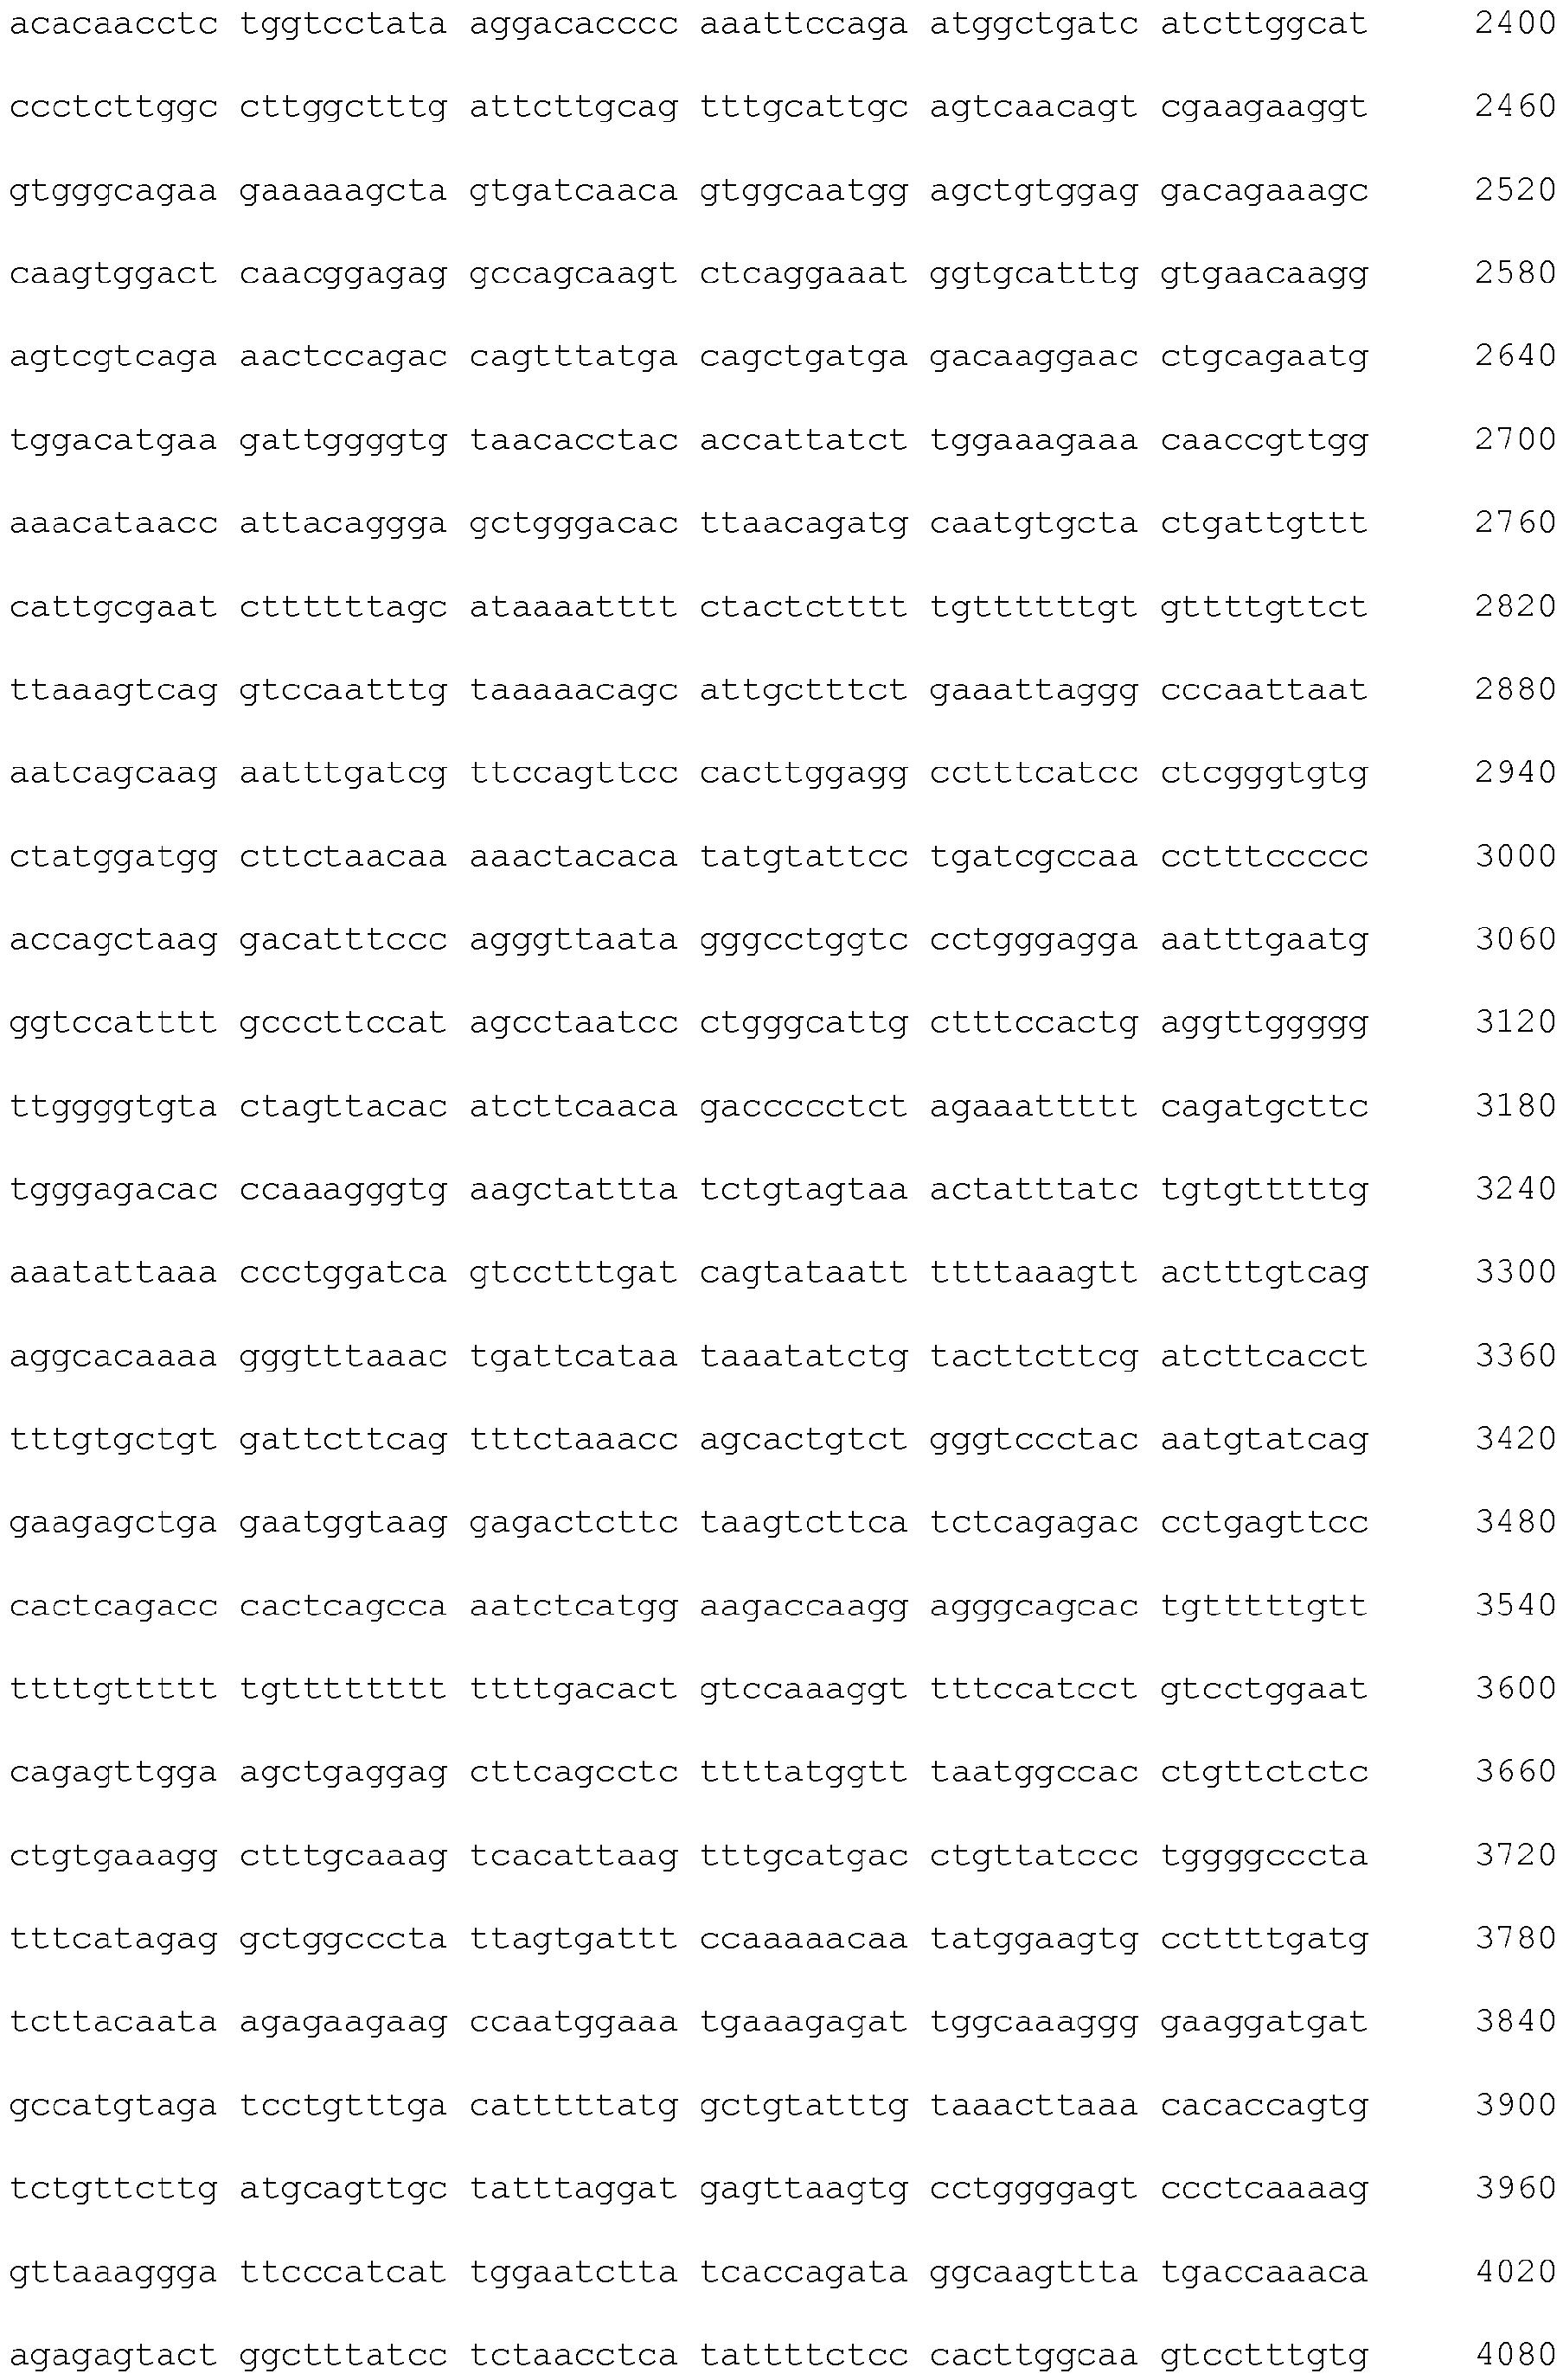 Figure imgb0180